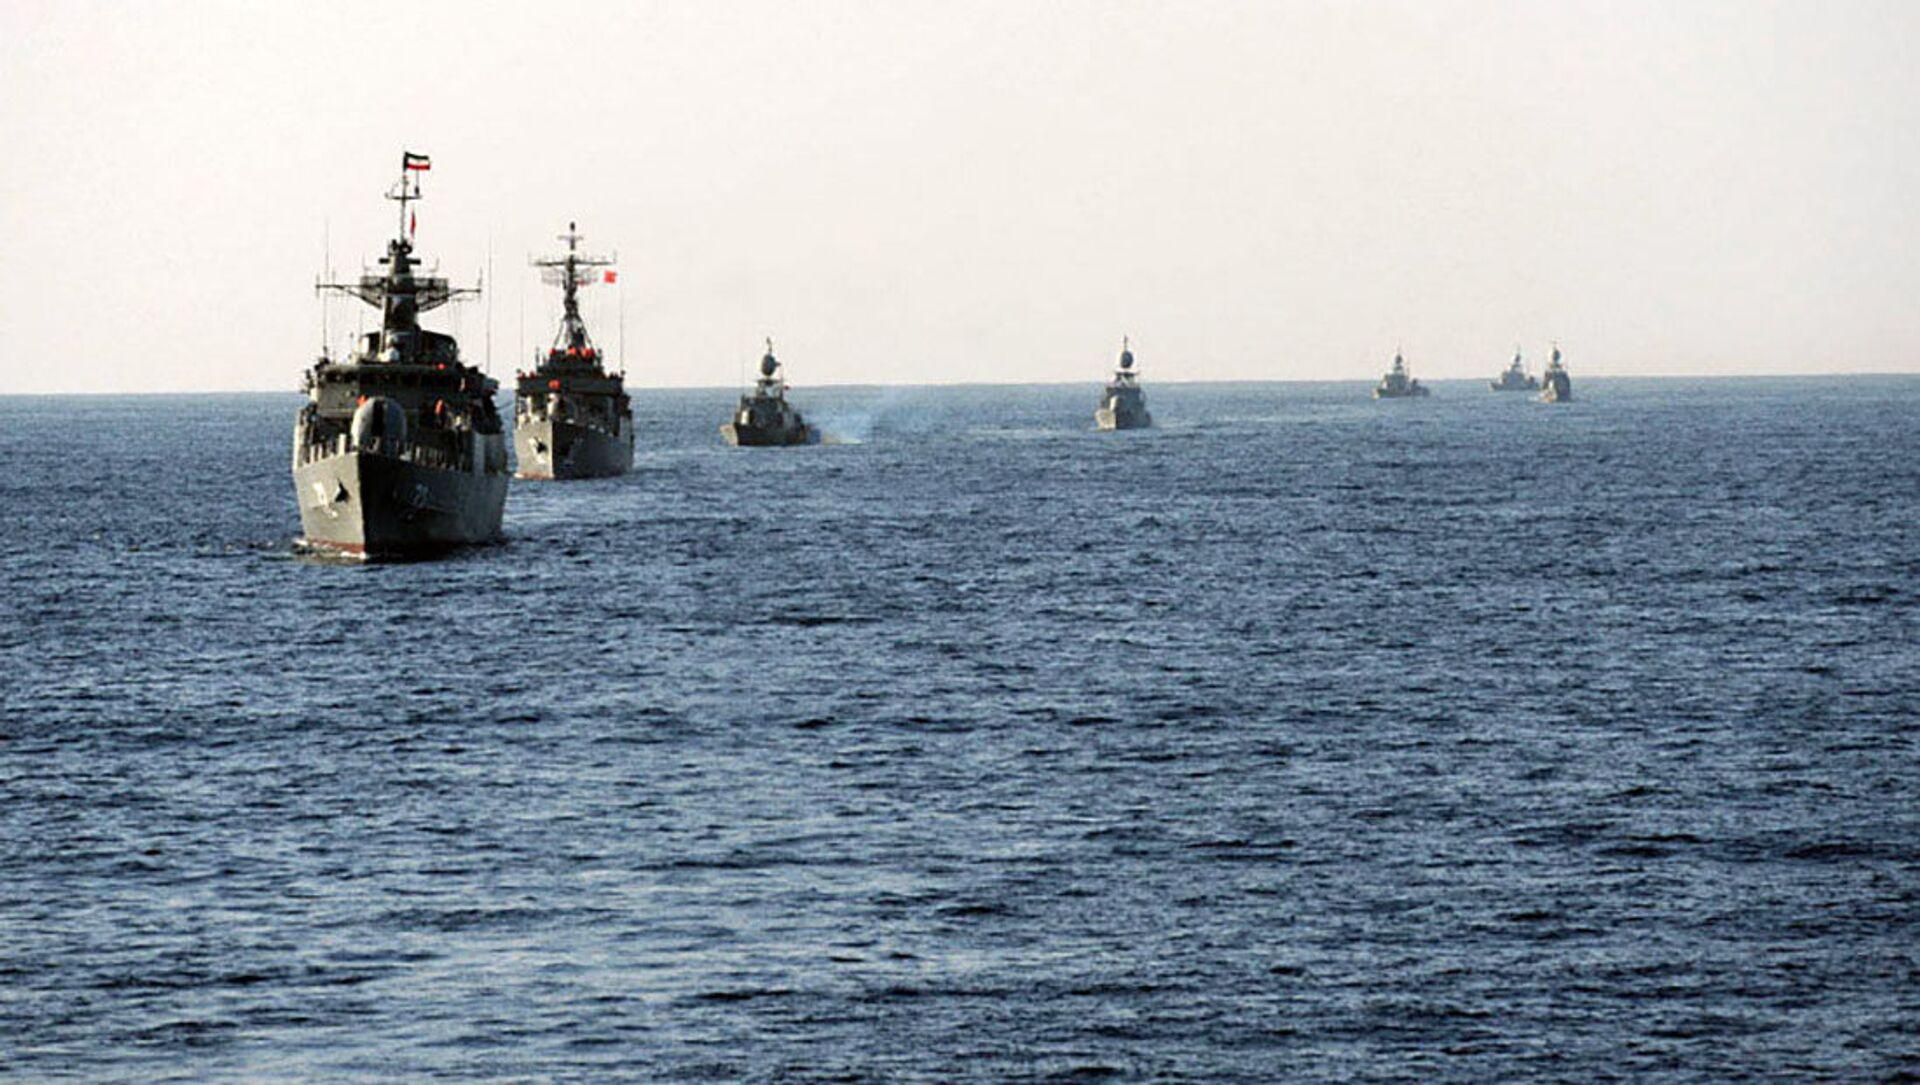 Hải quân của Iran ở eo biển Hormuz - Sputnik Việt Nam, 1920, 11.05.2021